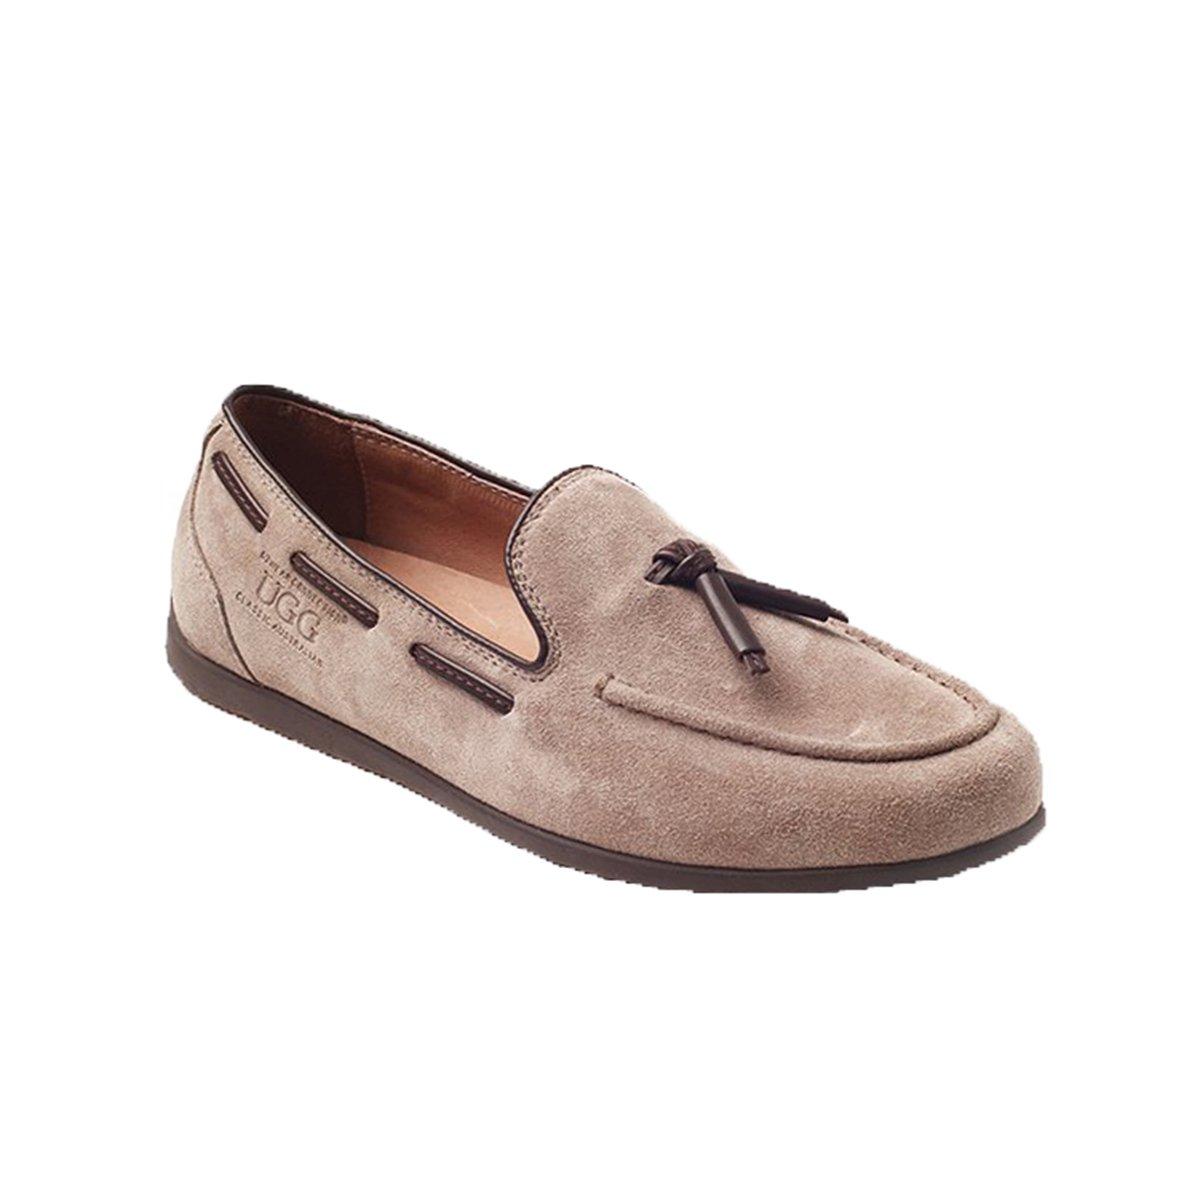 Ozwear UGG Men's Comfort Drawstring Peas Shoes Loafer Flats ,Khaki AU 11M/EU 45/ US11/ UK10.5